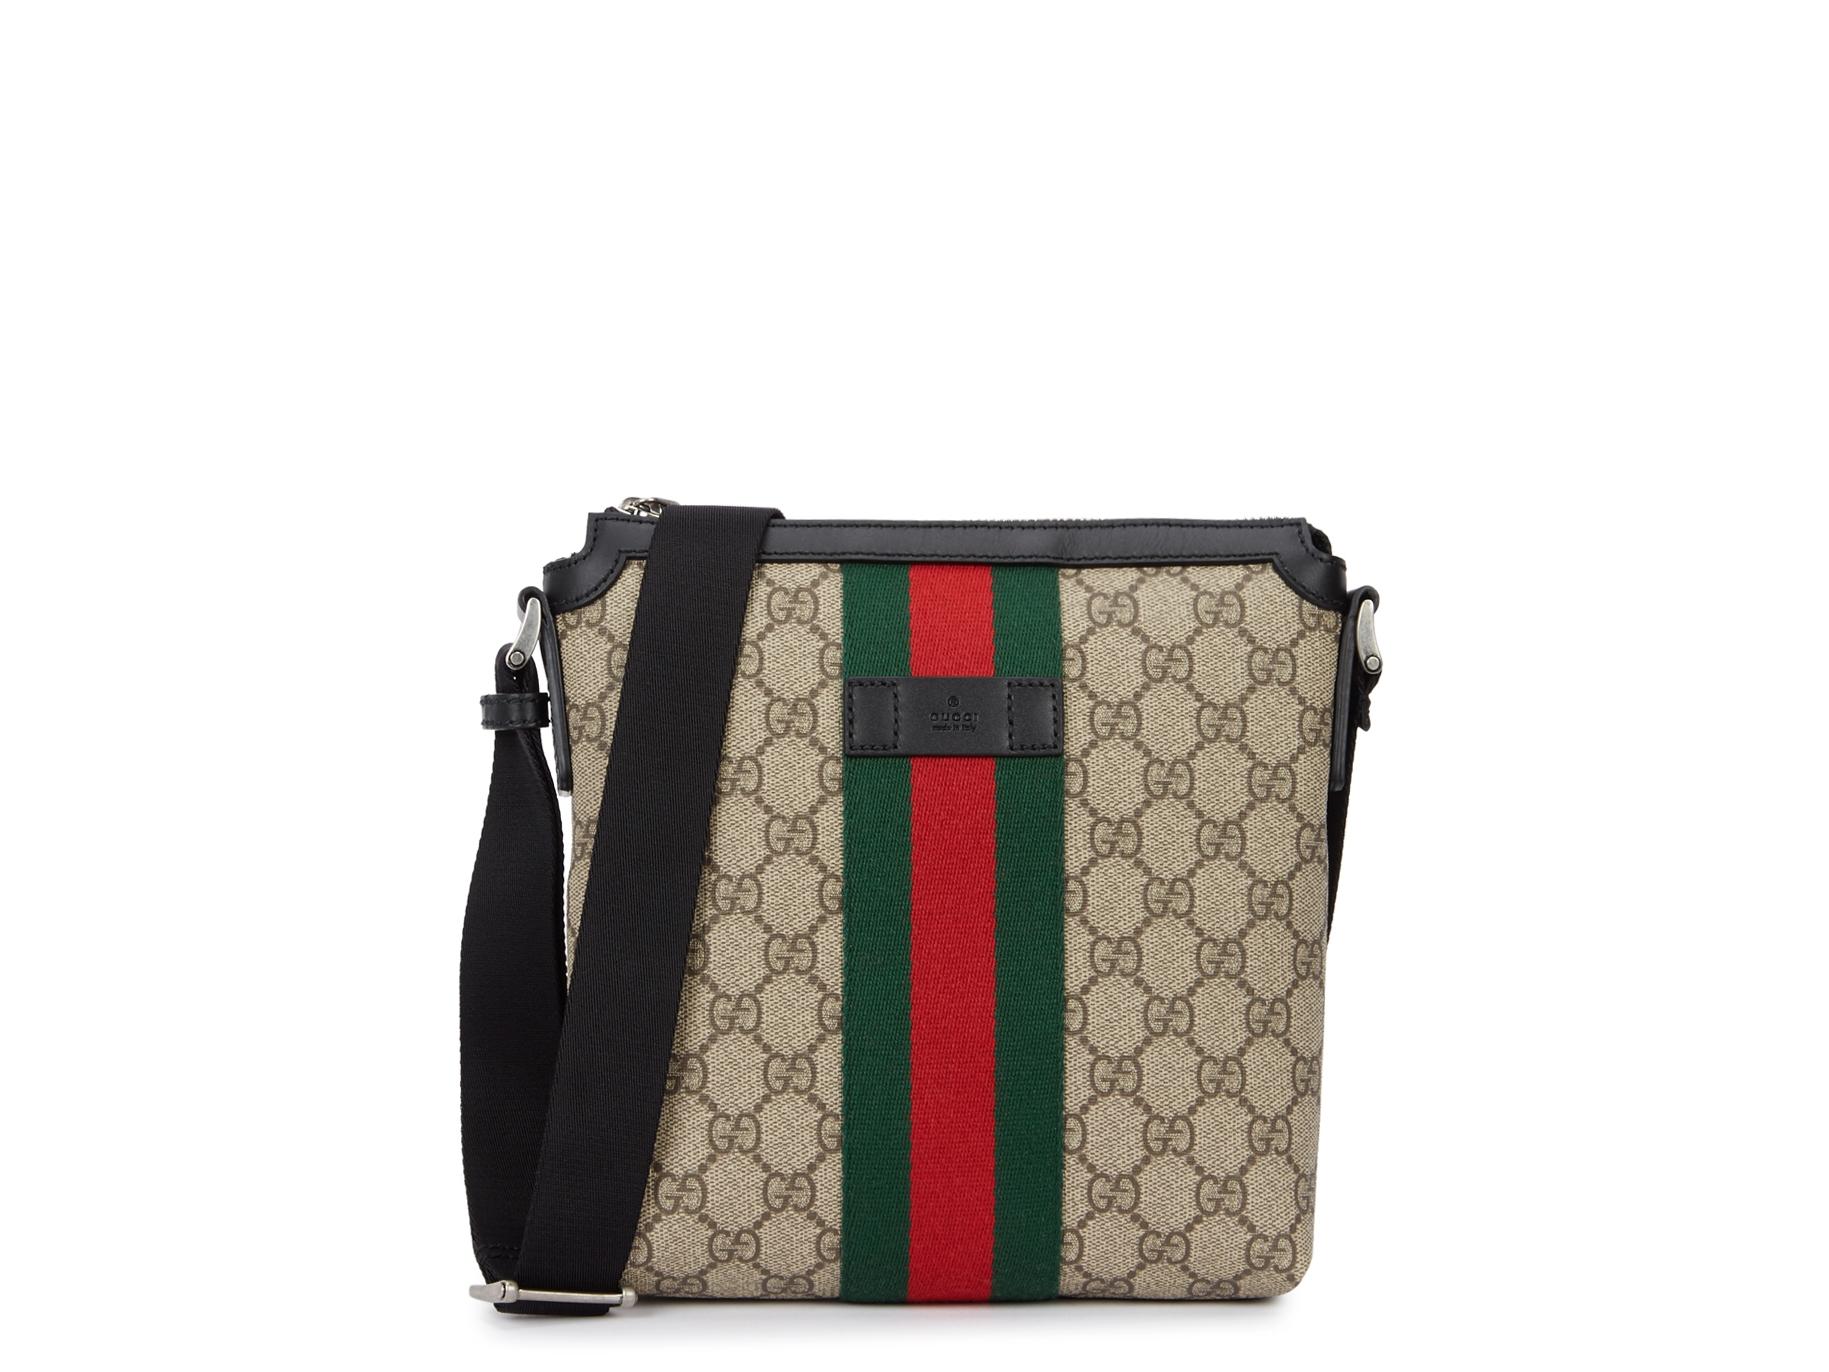 eb96c83122171 Gucci Web GG Supreme canvas messenger bag - Harvey Nichols